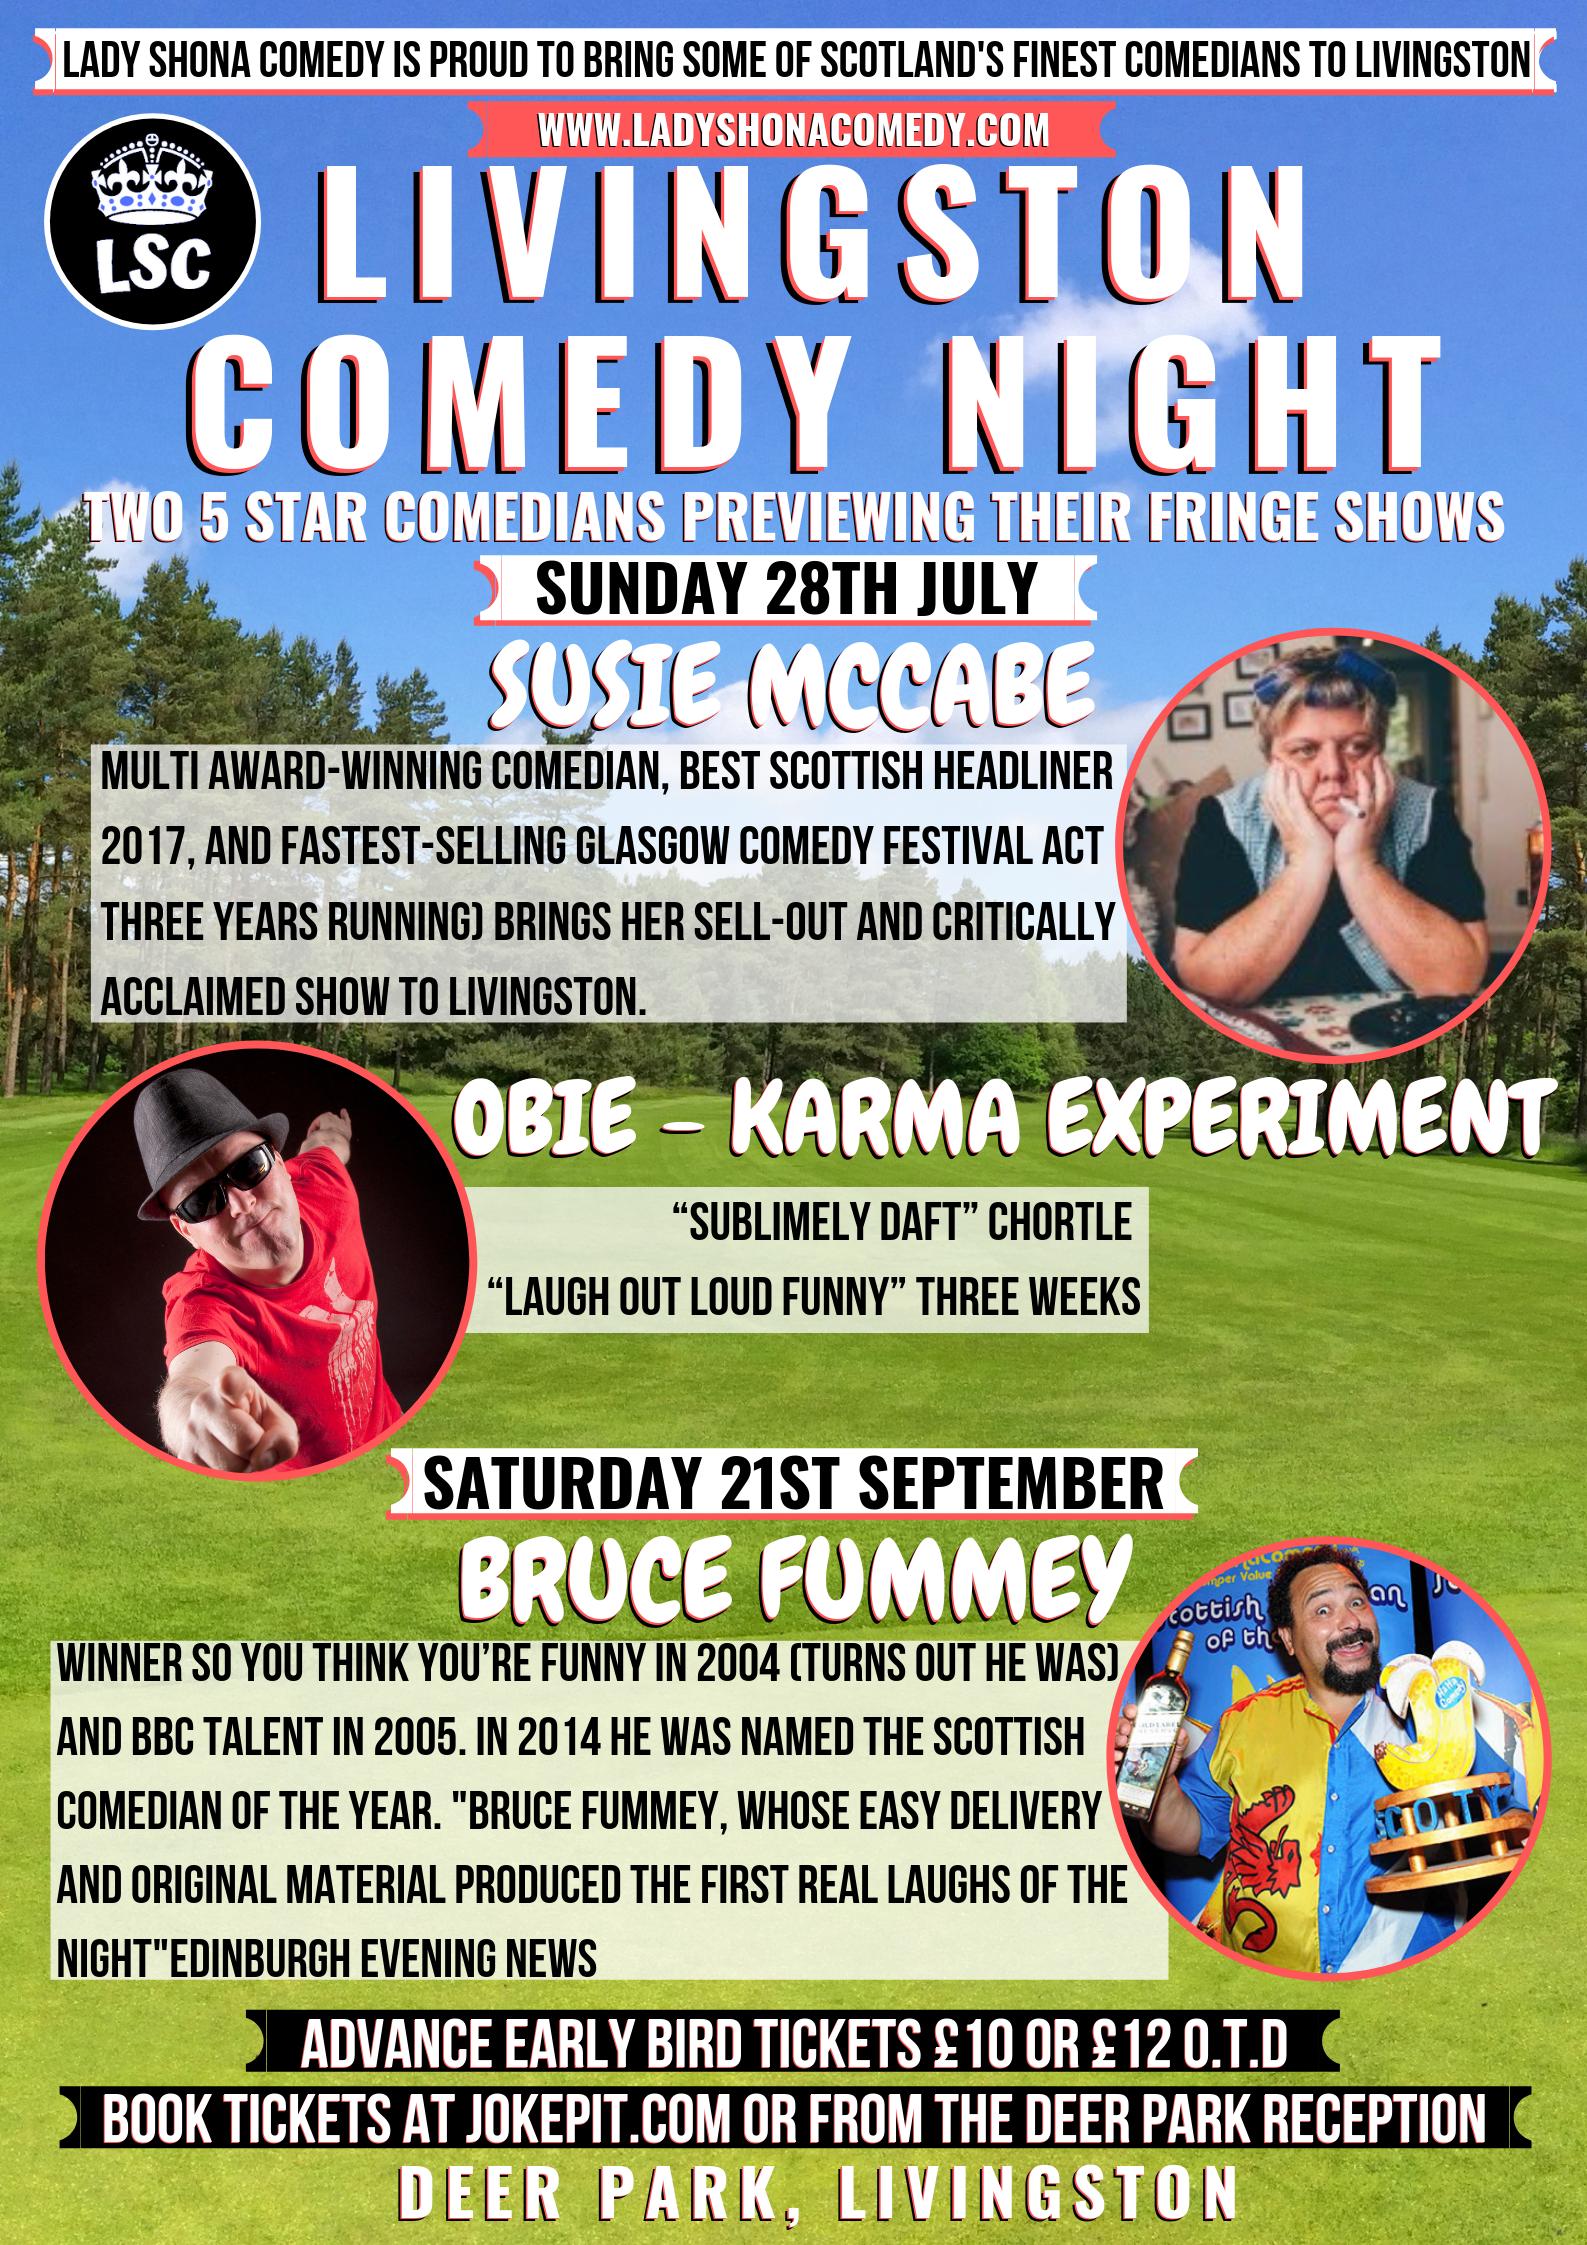 The livingston golf course lady shona comedy livingston comedy night 28th july 21st sept